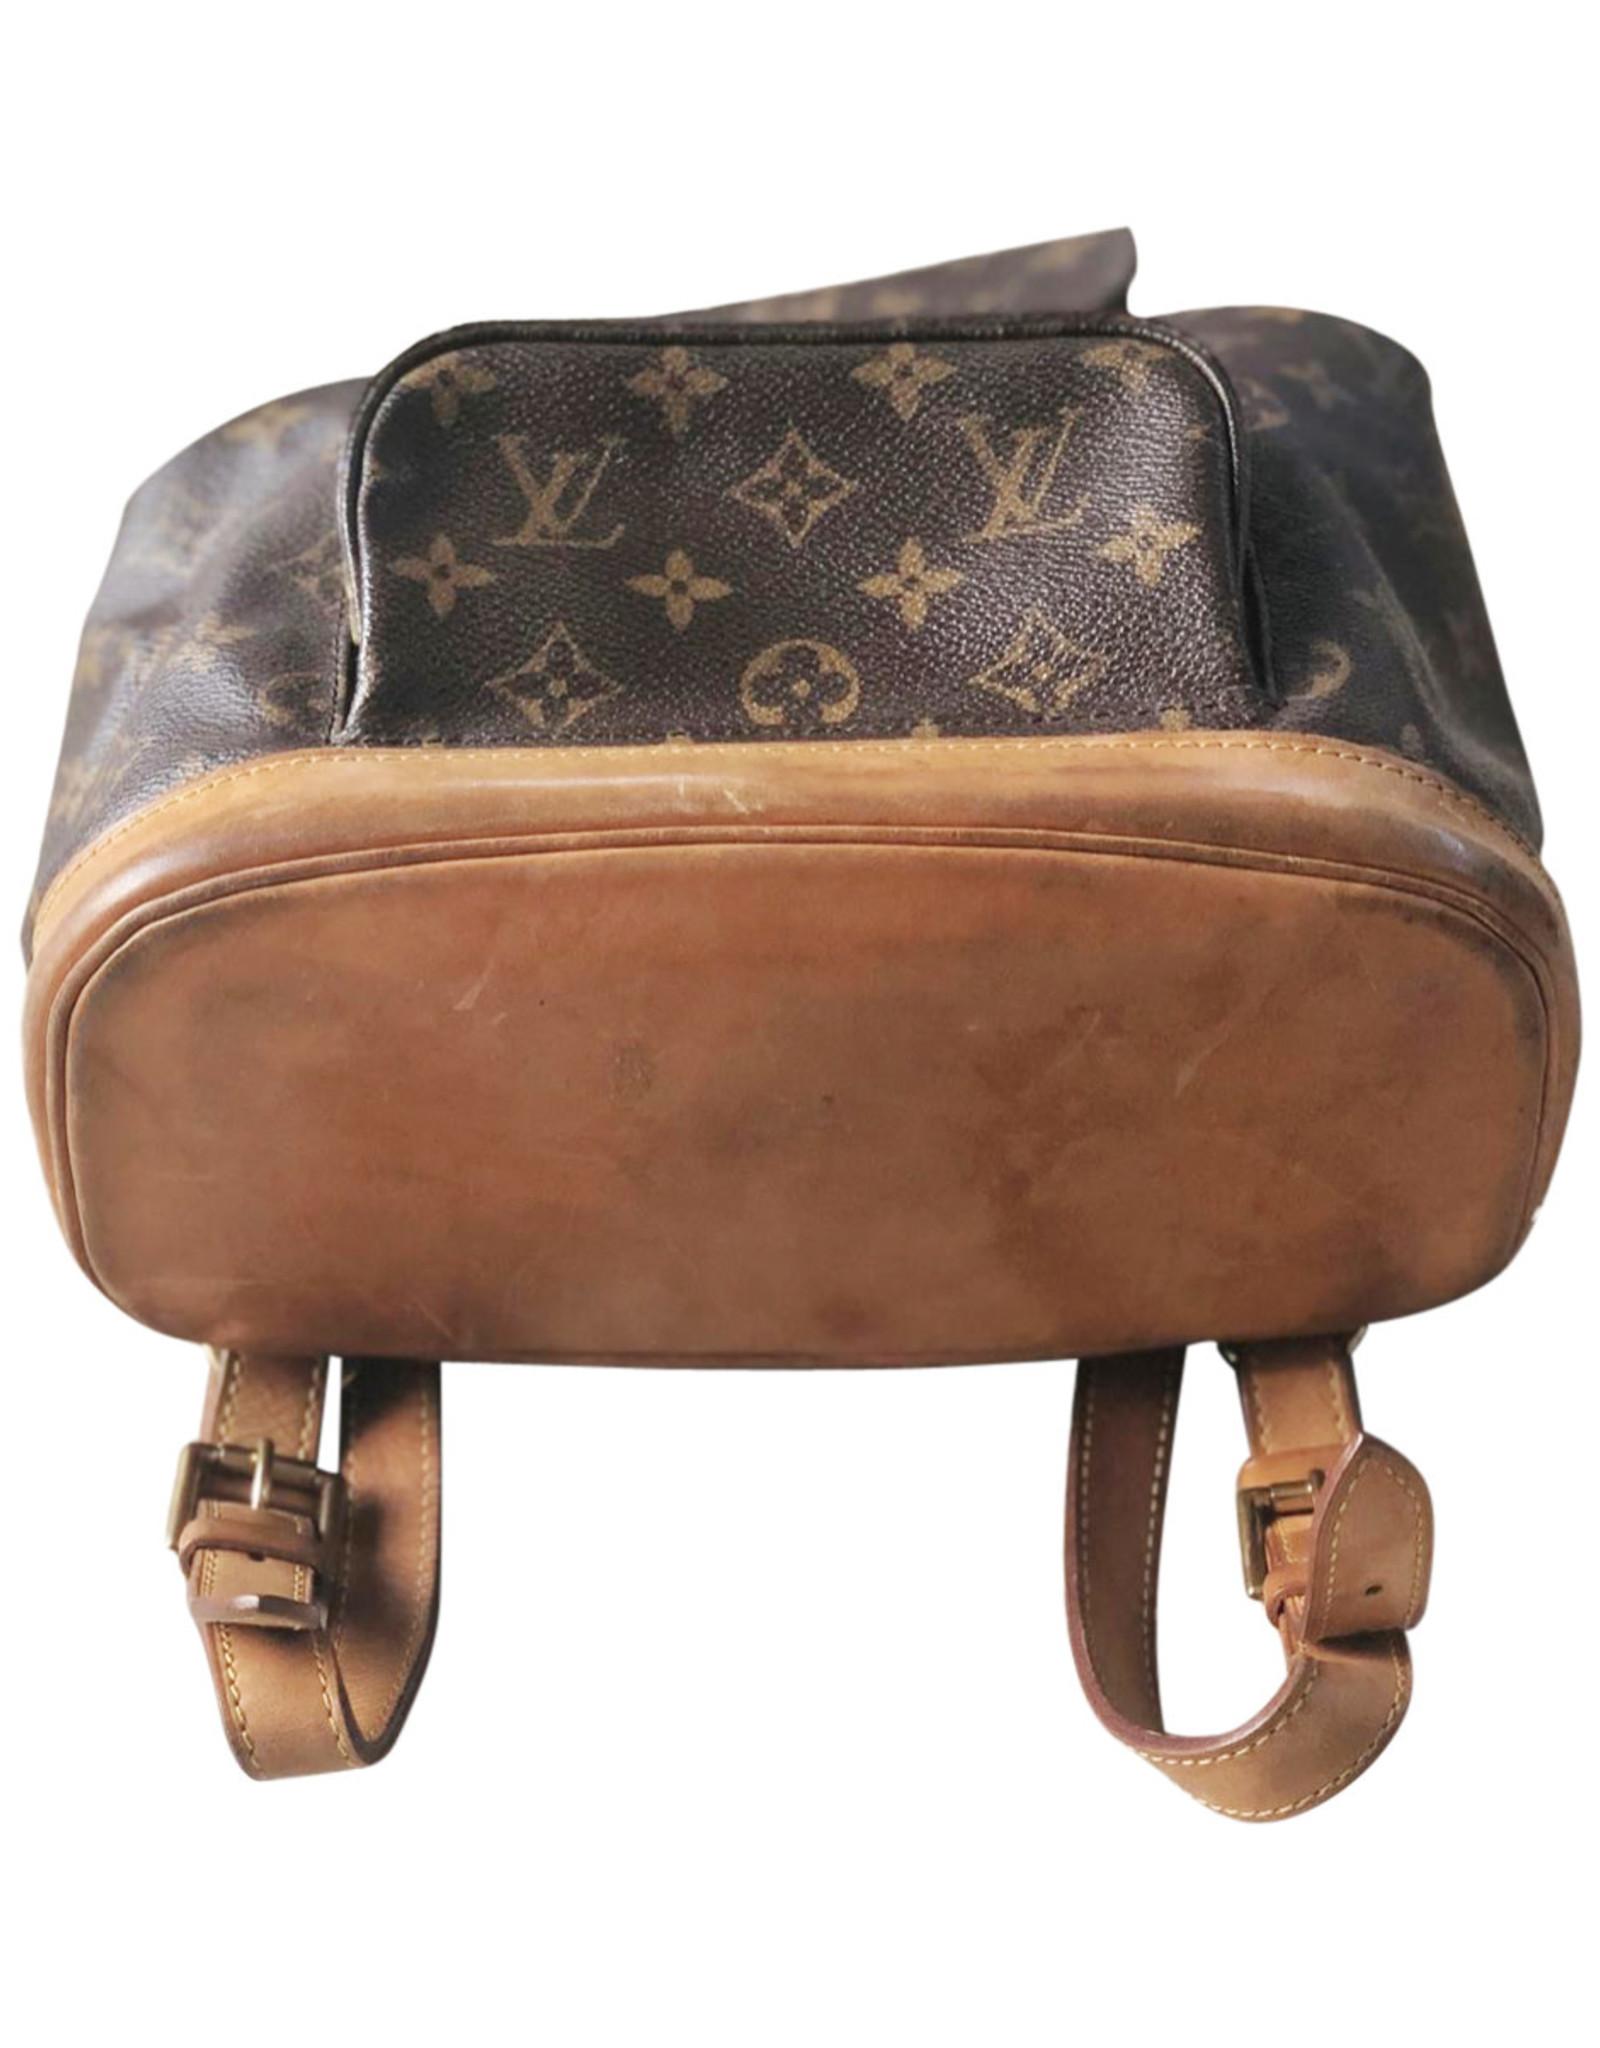 Louis Vuitton Louis Vuitton Classic Backpack (Collector's Vintage)